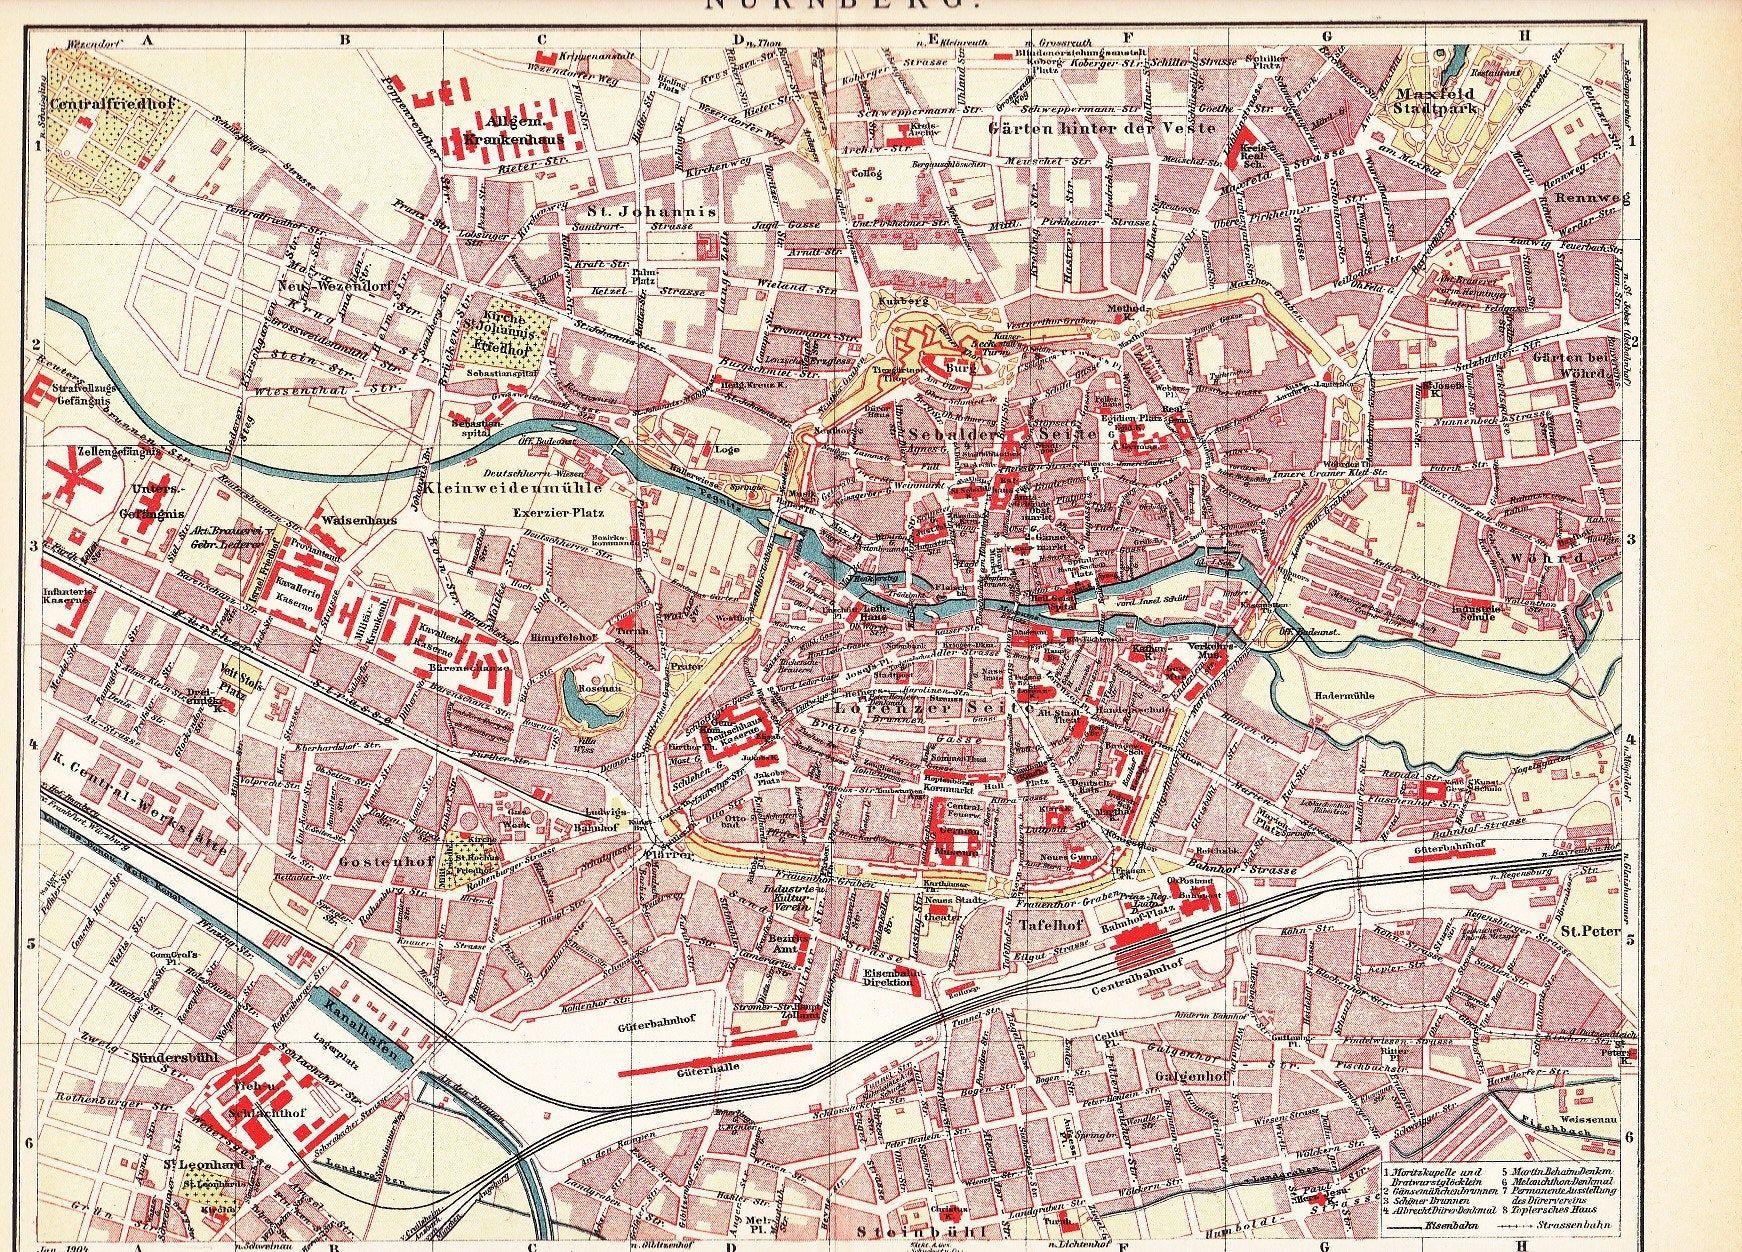 20 City Map of Nuremberg or Nürnberg, Bavaria, Germany at the ...